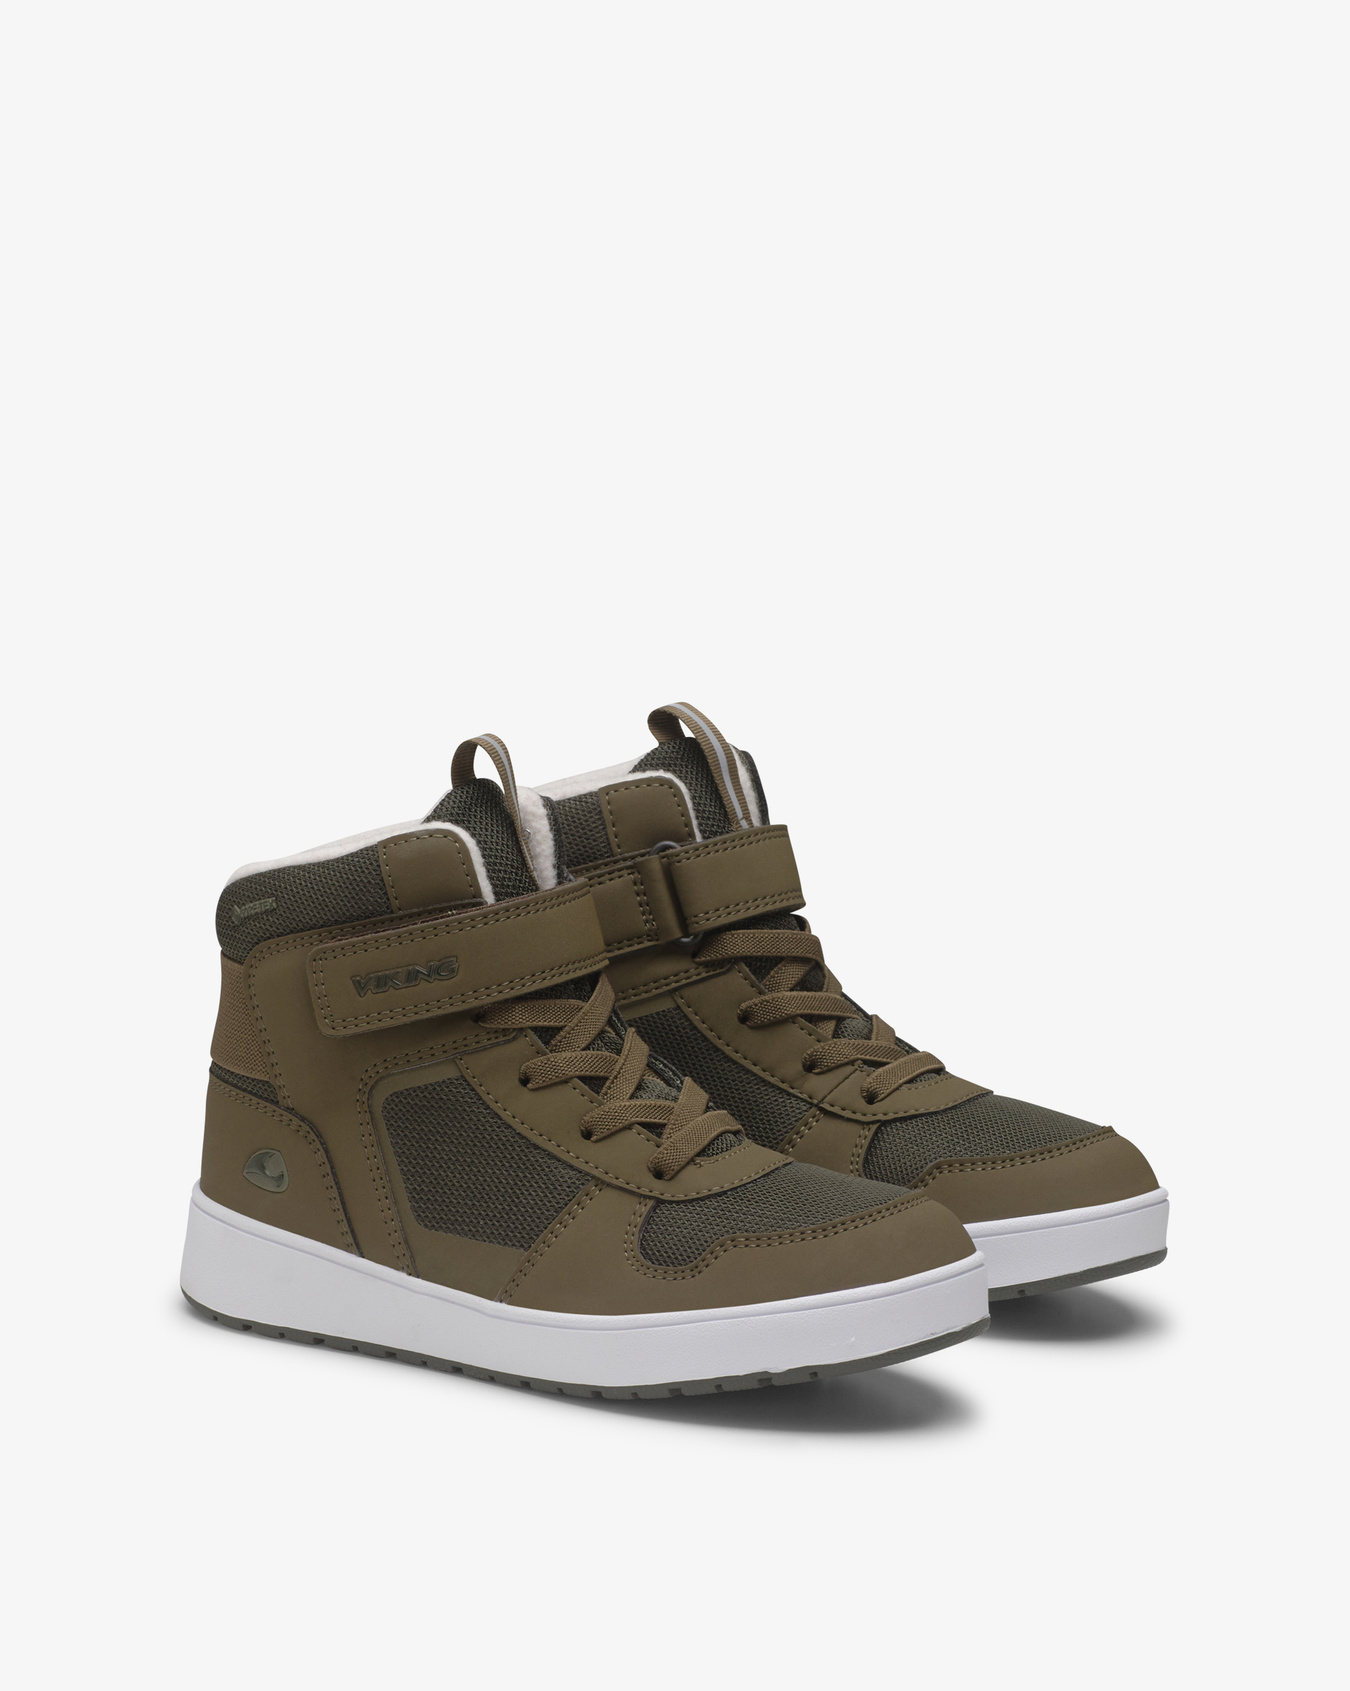 Jack Khaki Sneakers